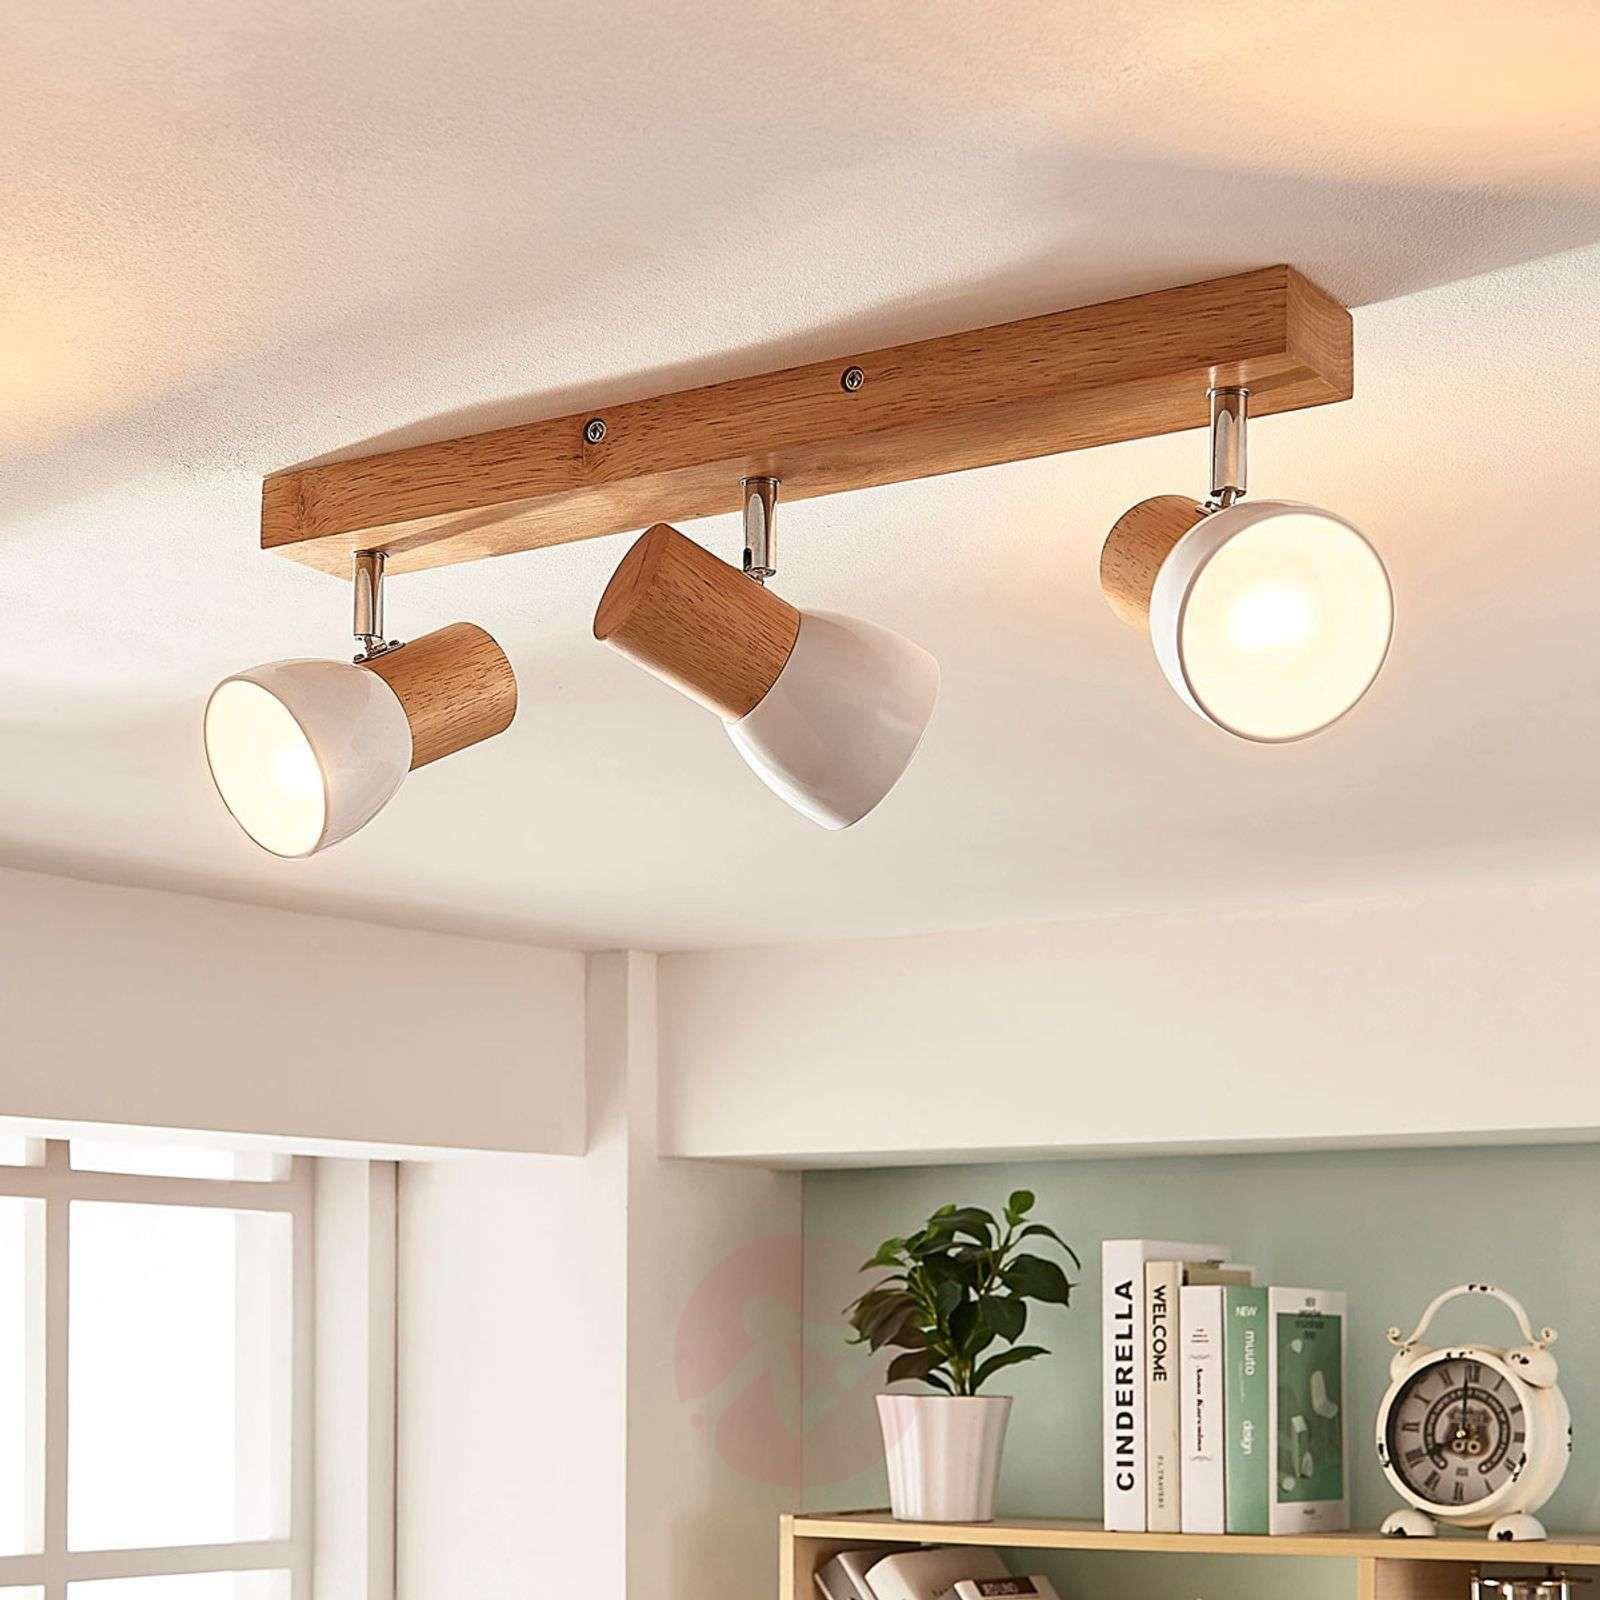 Basse Tension Salle De Bain trzypunktowa lampa sufitowa thorin z drewnem en 2020